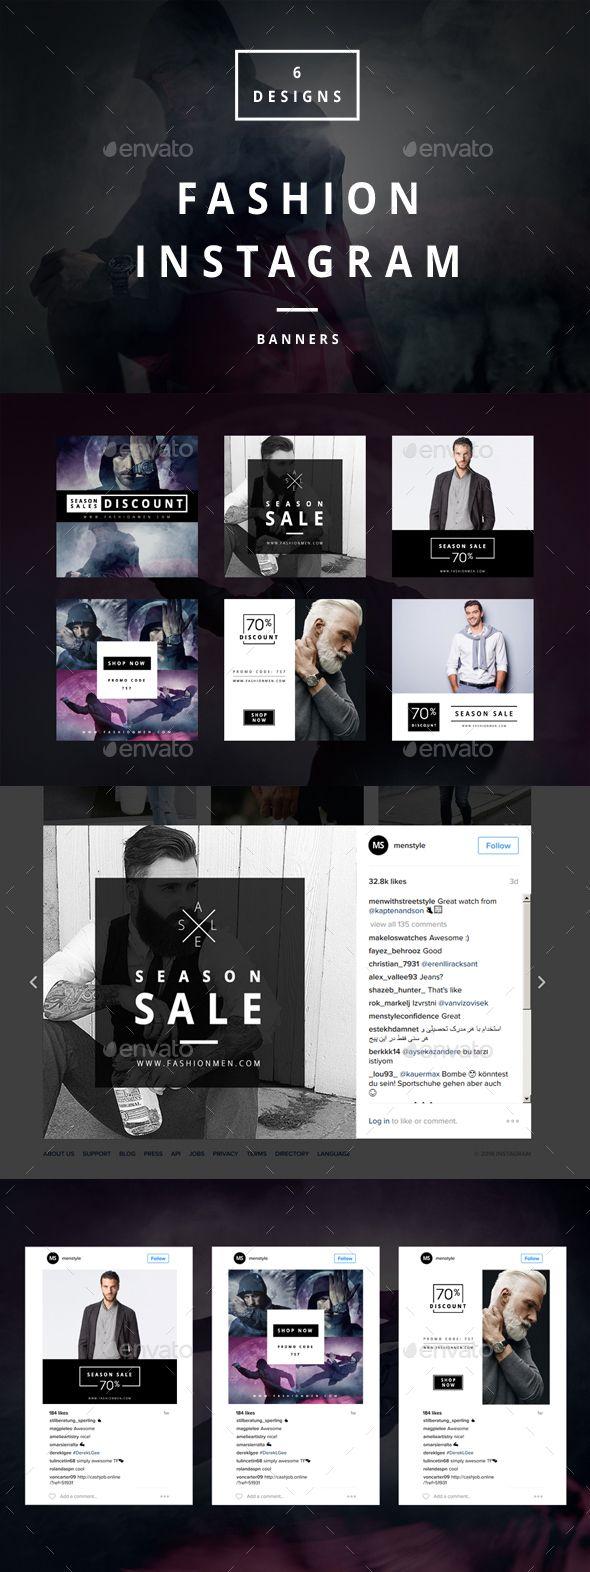 Fashion Instagram  6 Designs  — PSD Template #instagram • Download ➝ https://graphicriver.net/item/fashion-instagram-6-designs/18469484?ref=pxcr